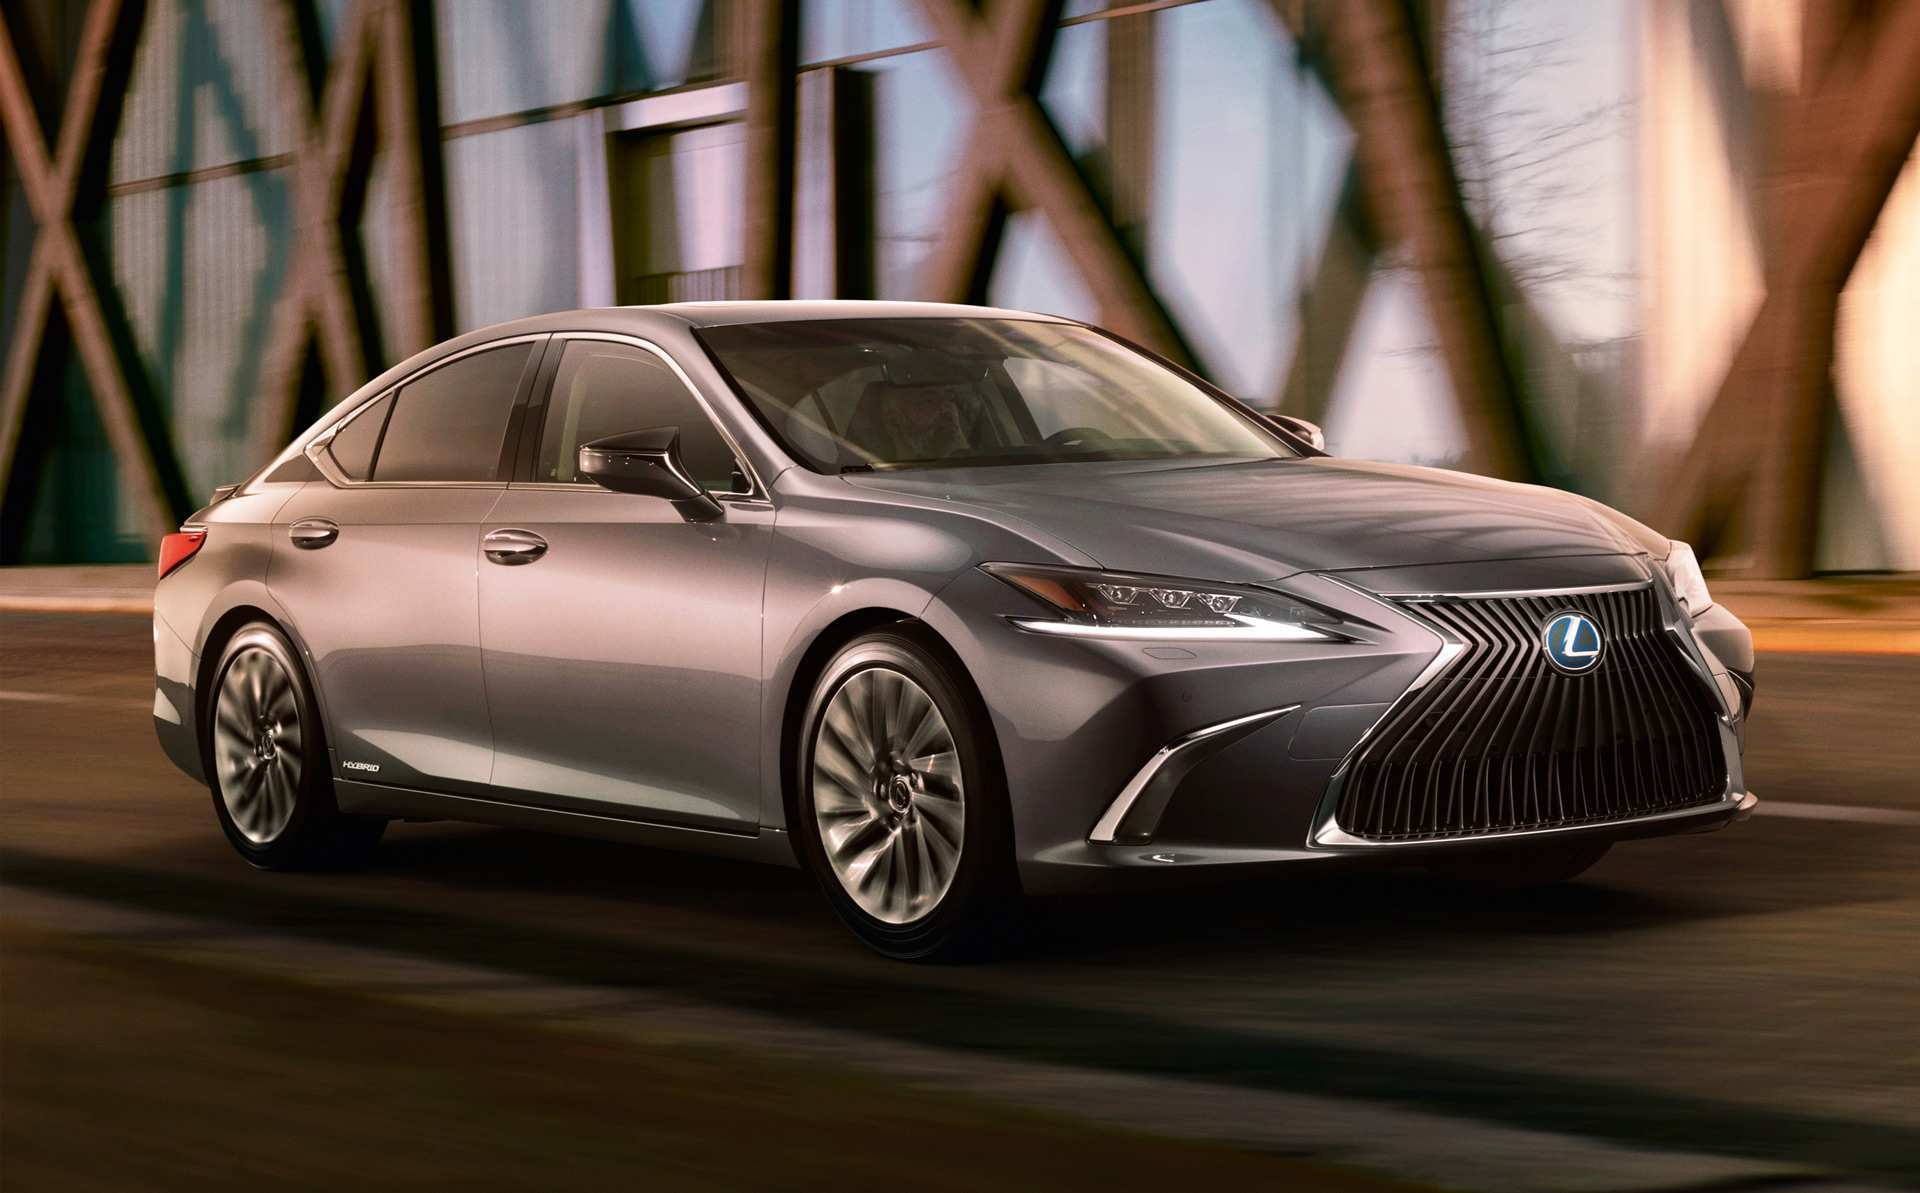 43 All New Lexus Es 2020 Debut Reviews for Lexus Es 2020 Debut